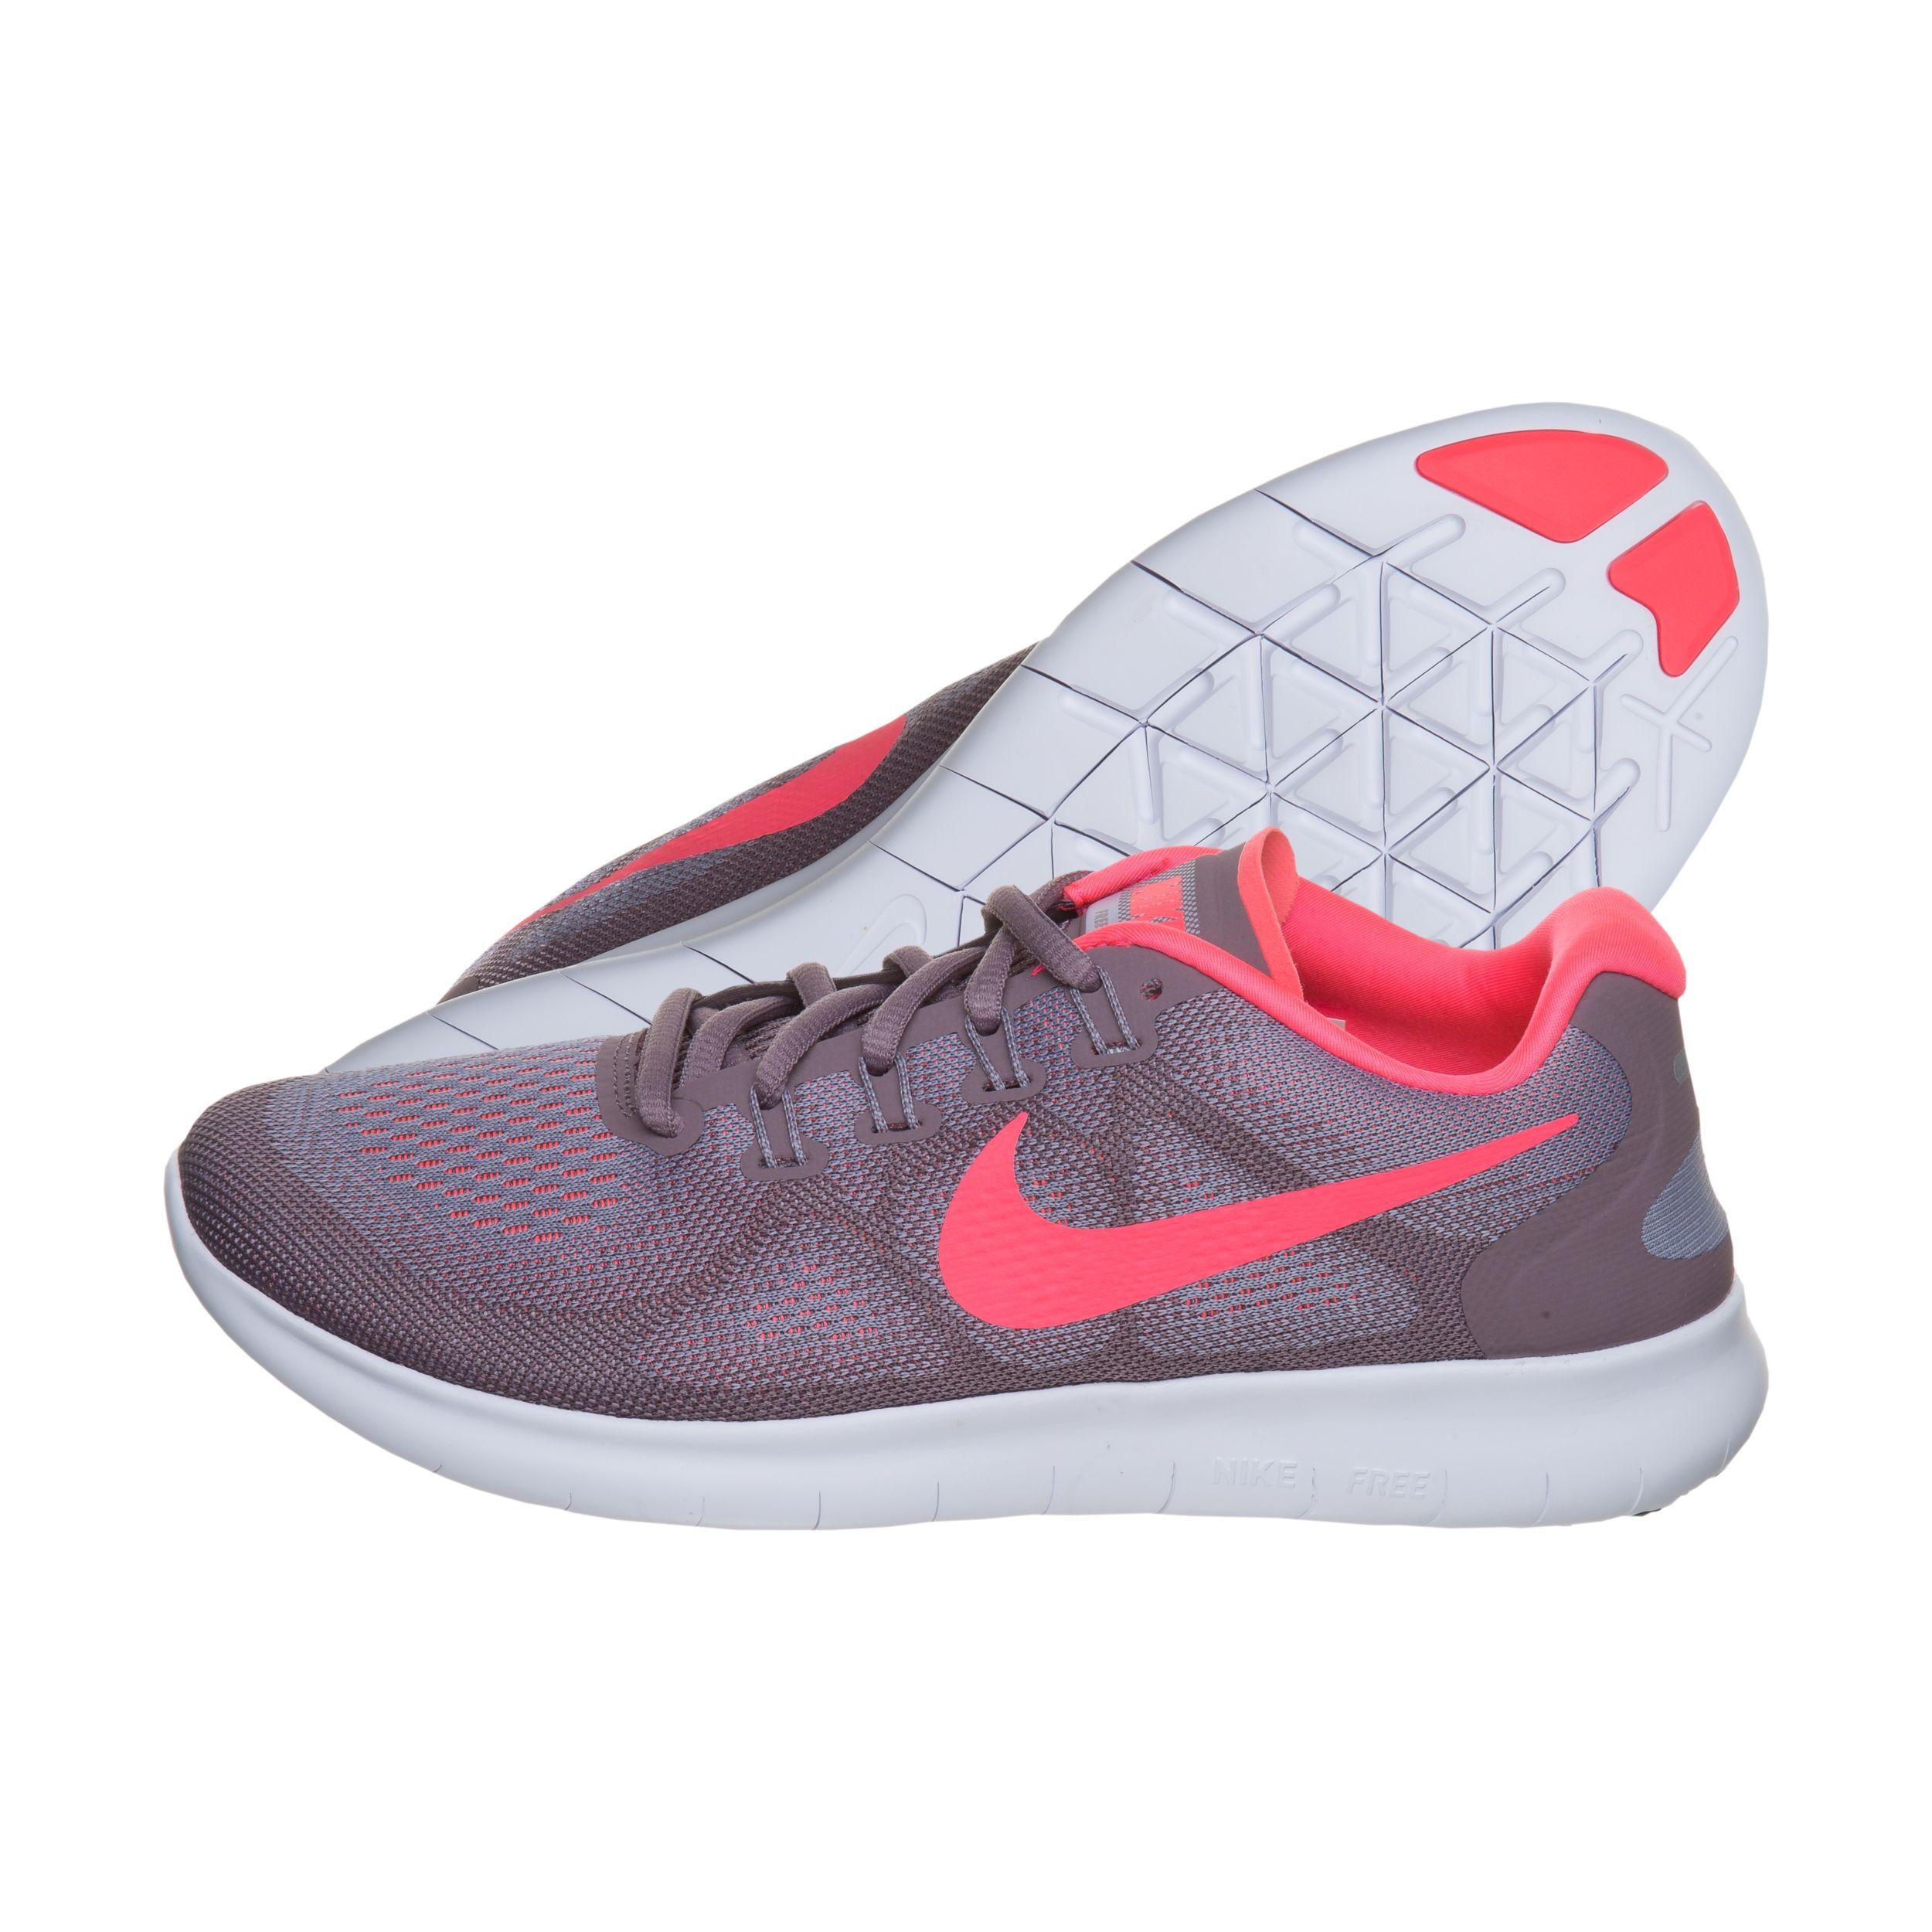 Teamsport Philipp | Nike Free Run 2017 Damen 880840-501 | günstig ...